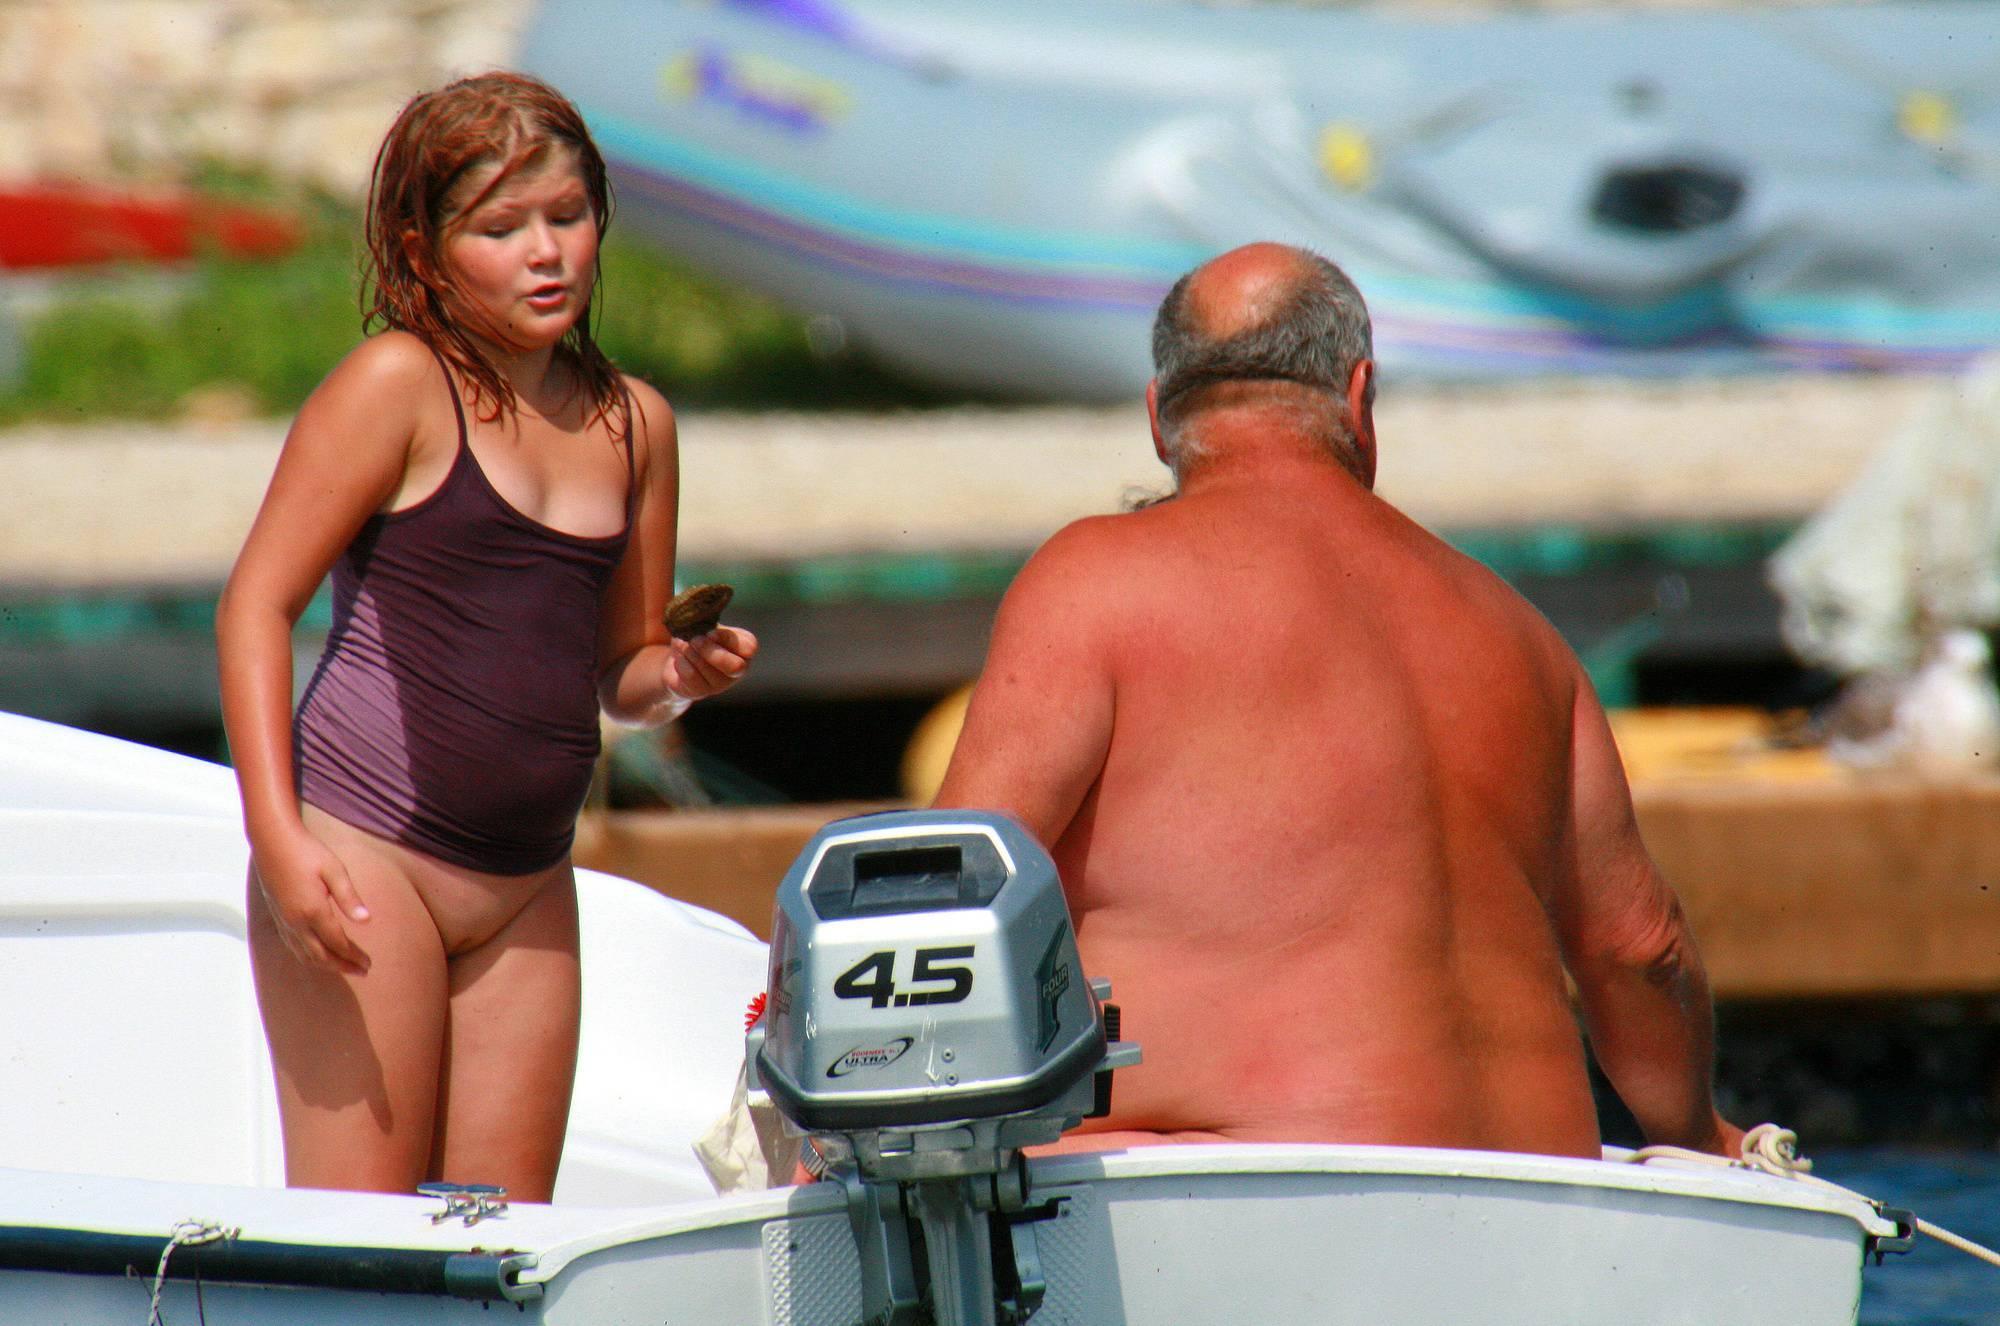 Nudist Pictures Uka FKK In-Water Boating - 1